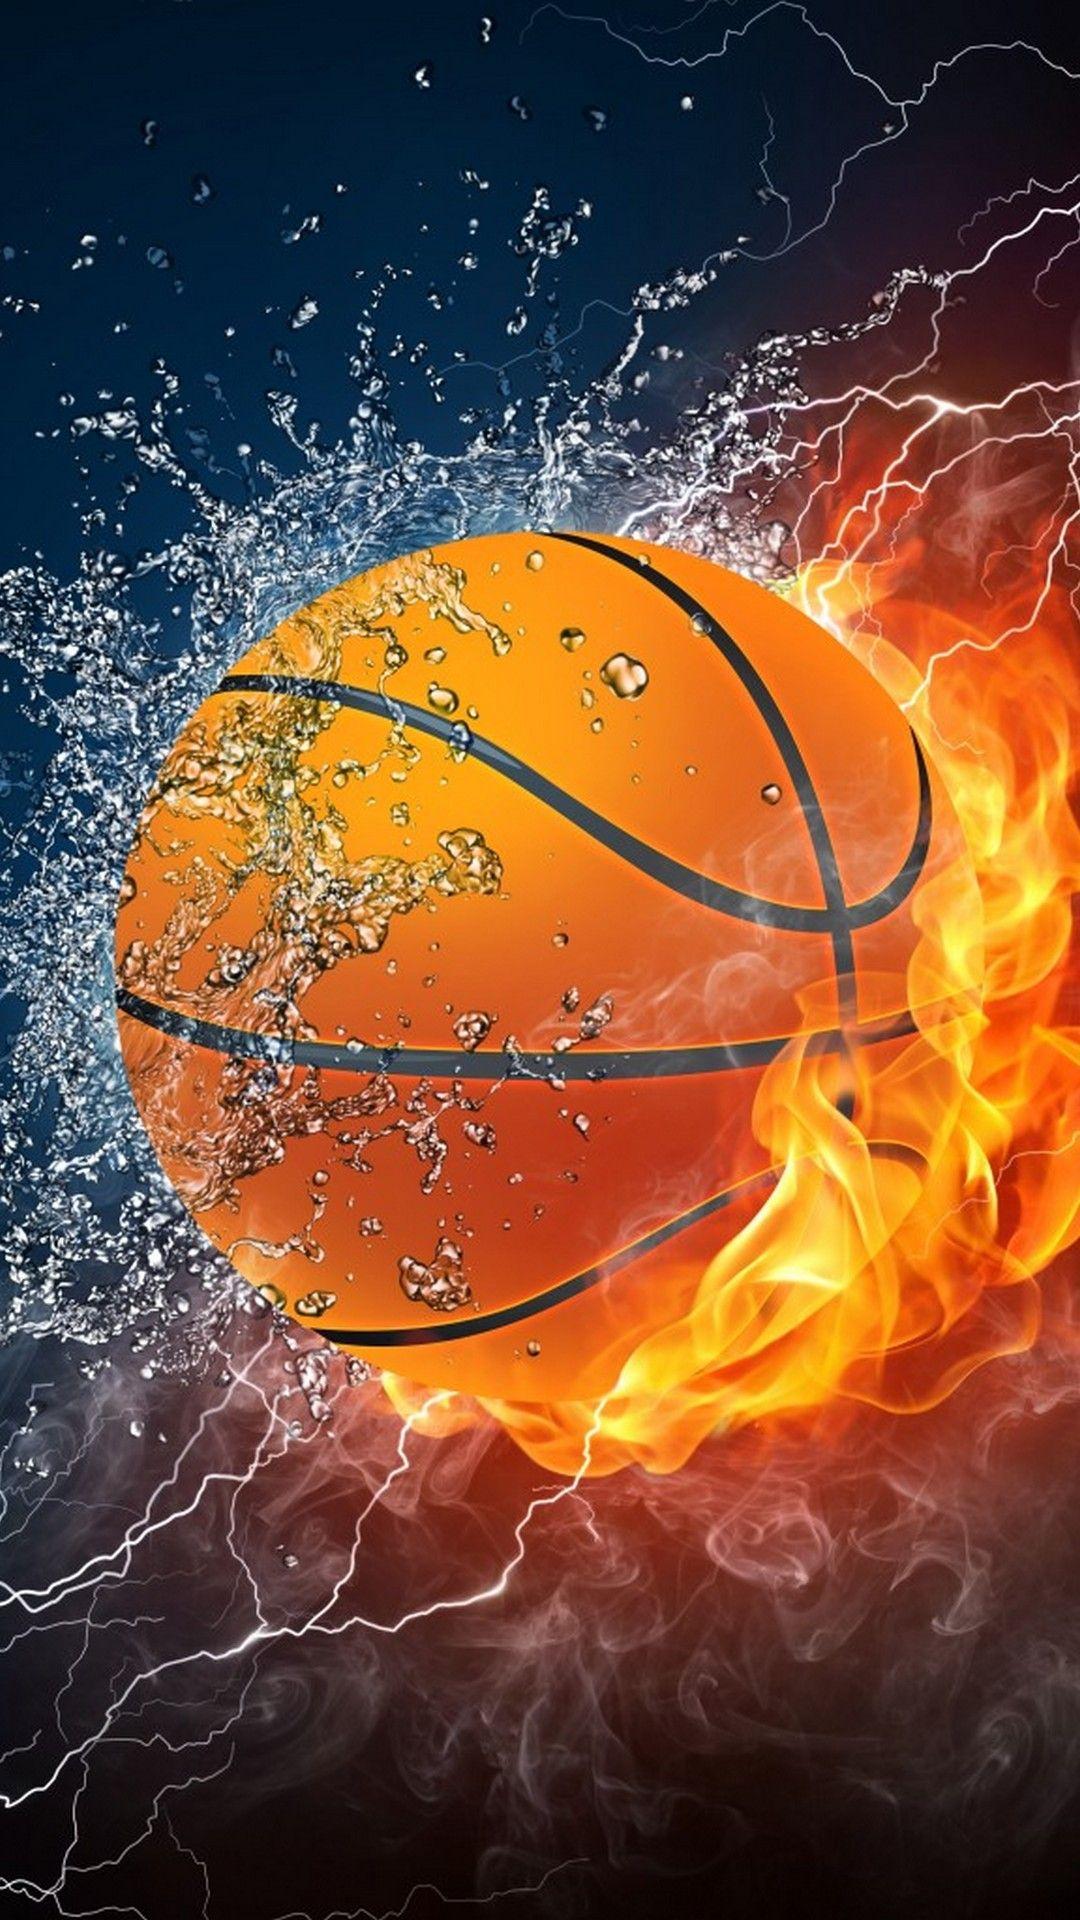 Basketball Mobile Wallpaper 2021 Basketball Wallpaper 1080x1920